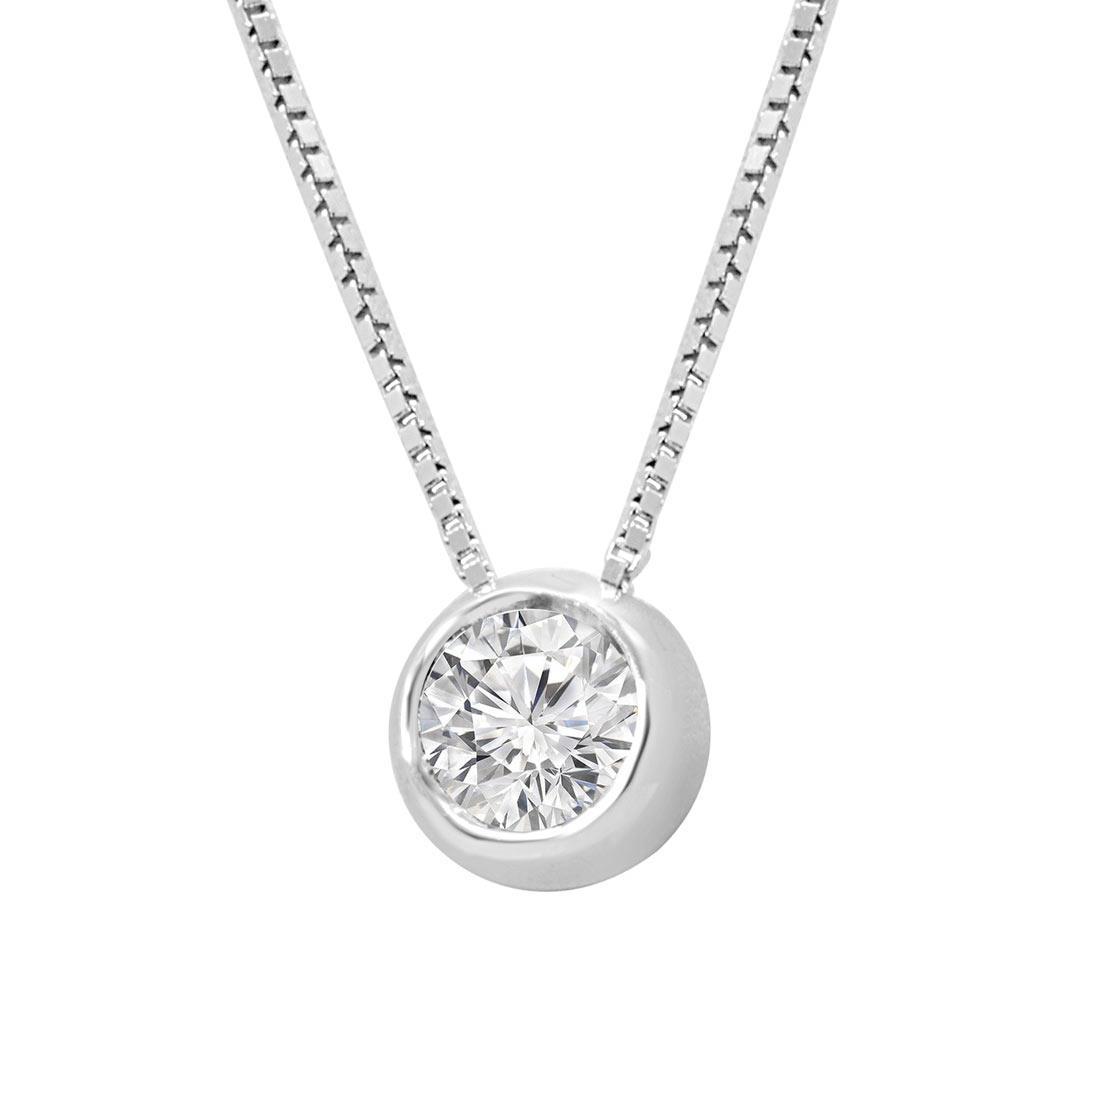 Collier punto luce con diamante 0,48 ct - ALFIERI ST JOHN